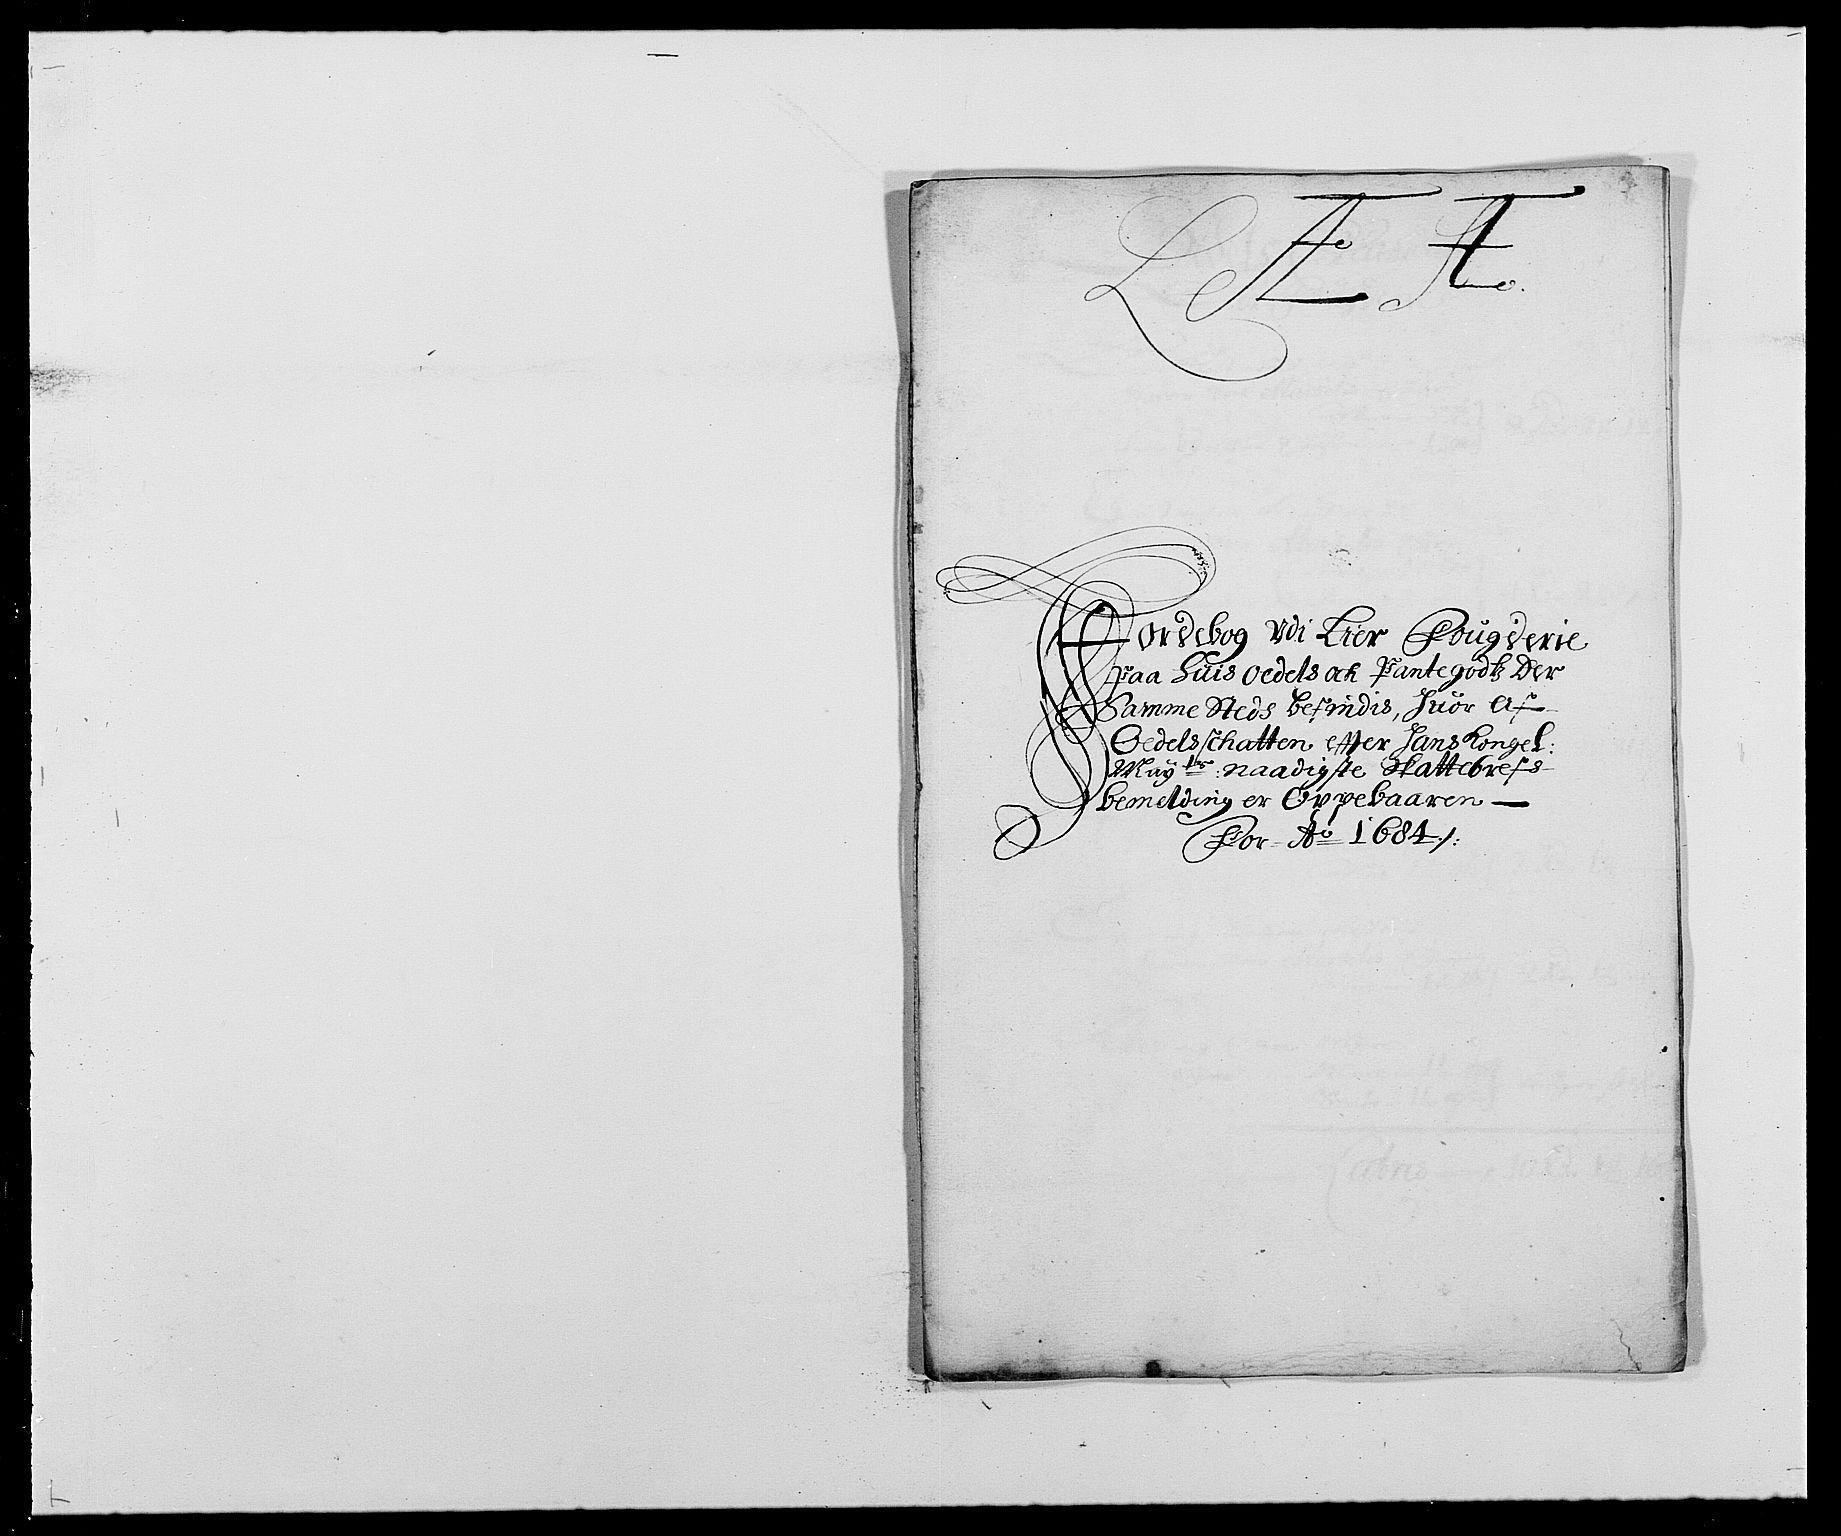 RA, Rentekammeret inntil 1814, Reviderte regnskaper, Fogderegnskap, R27/L1687: Fogderegnskap Lier, 1678-1686, s. 119